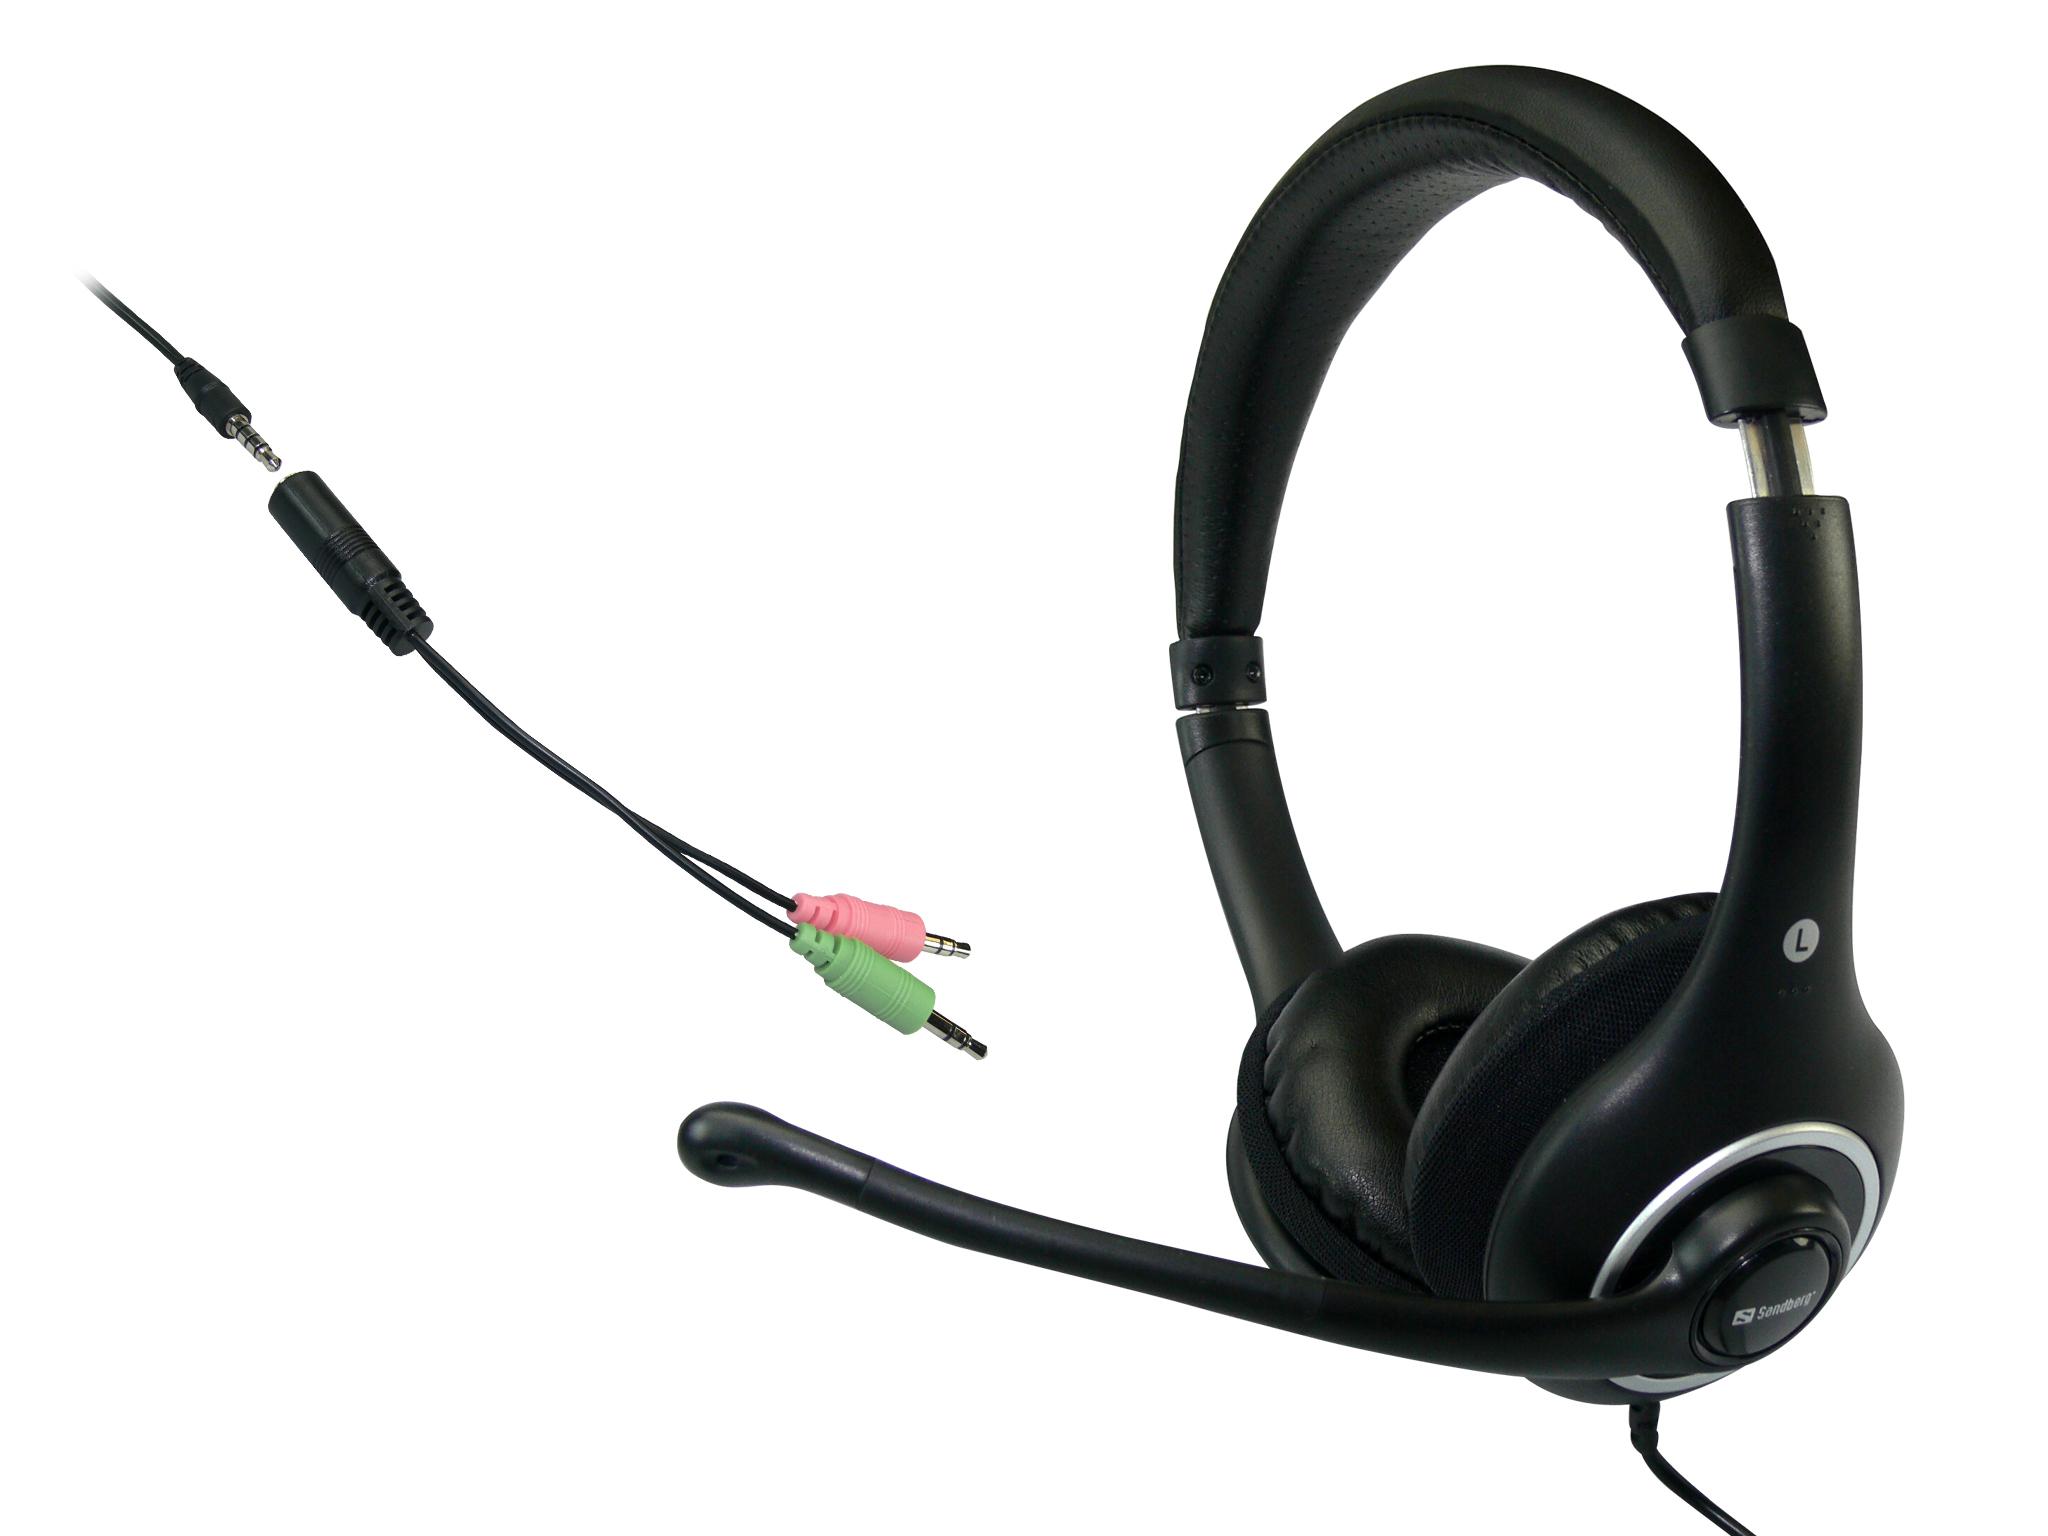 SANDBERG Plug n Talk Headset Schwartz mit Mikrofon und Lautstaerkeregler Adapter fuer PC Mobil Tablet inkludiert